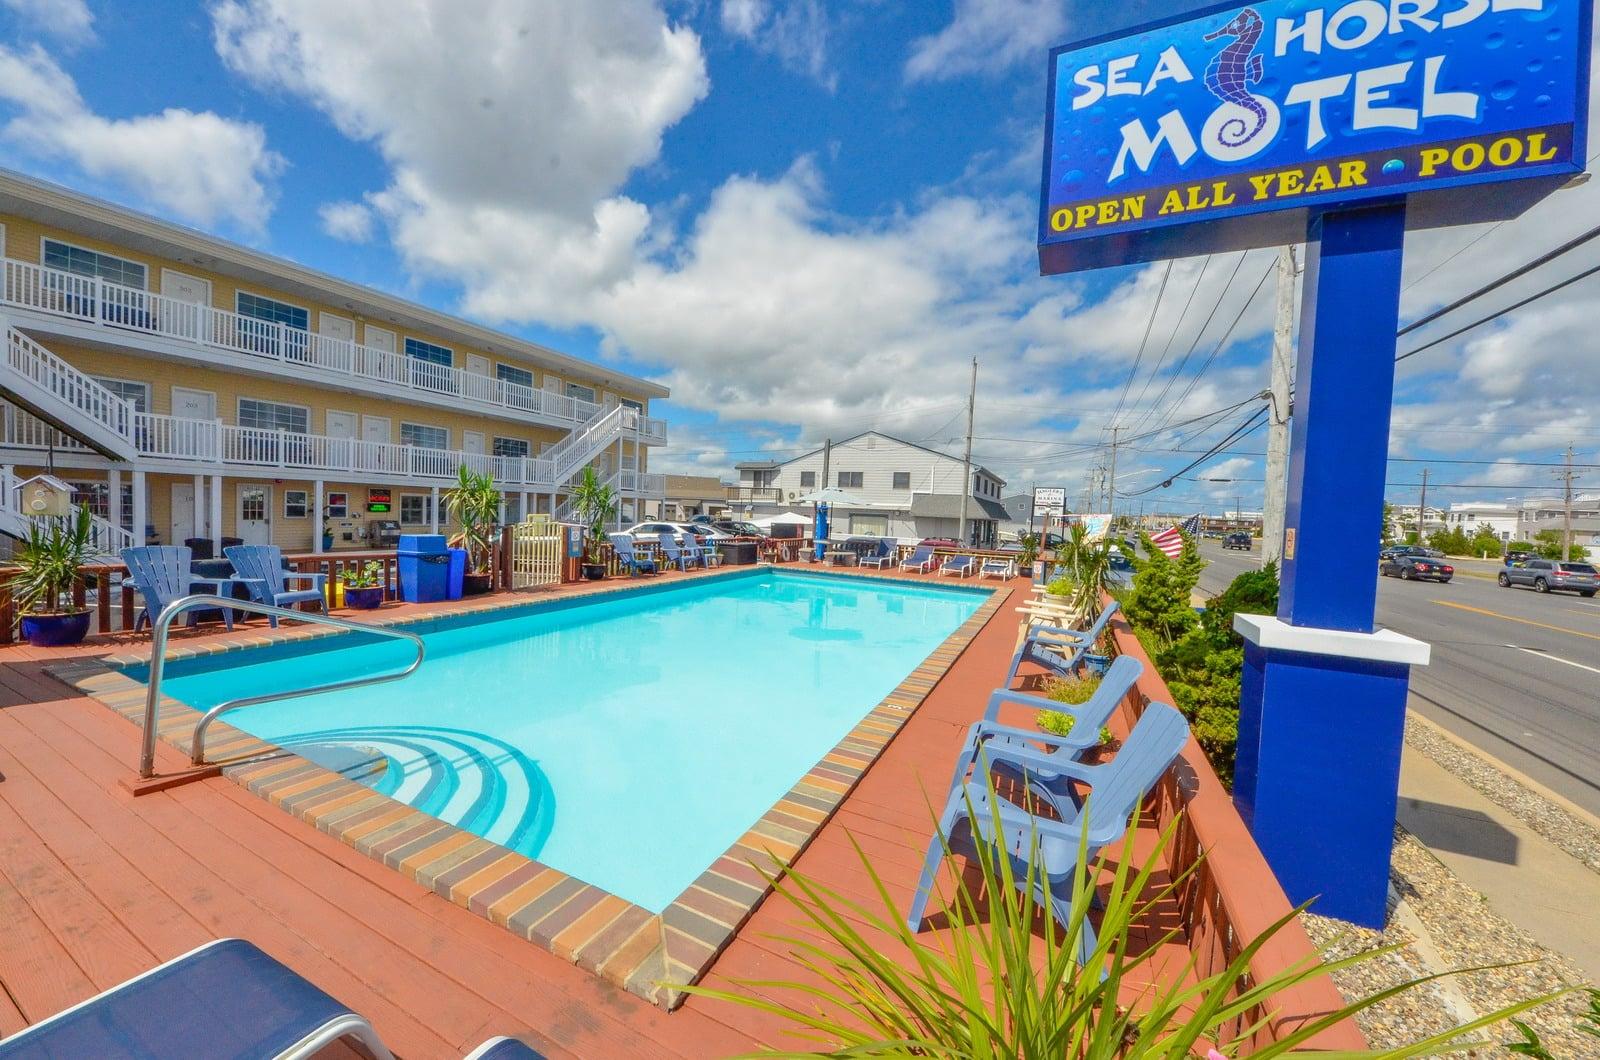 Seahorse Motel Long Beach Island Nj